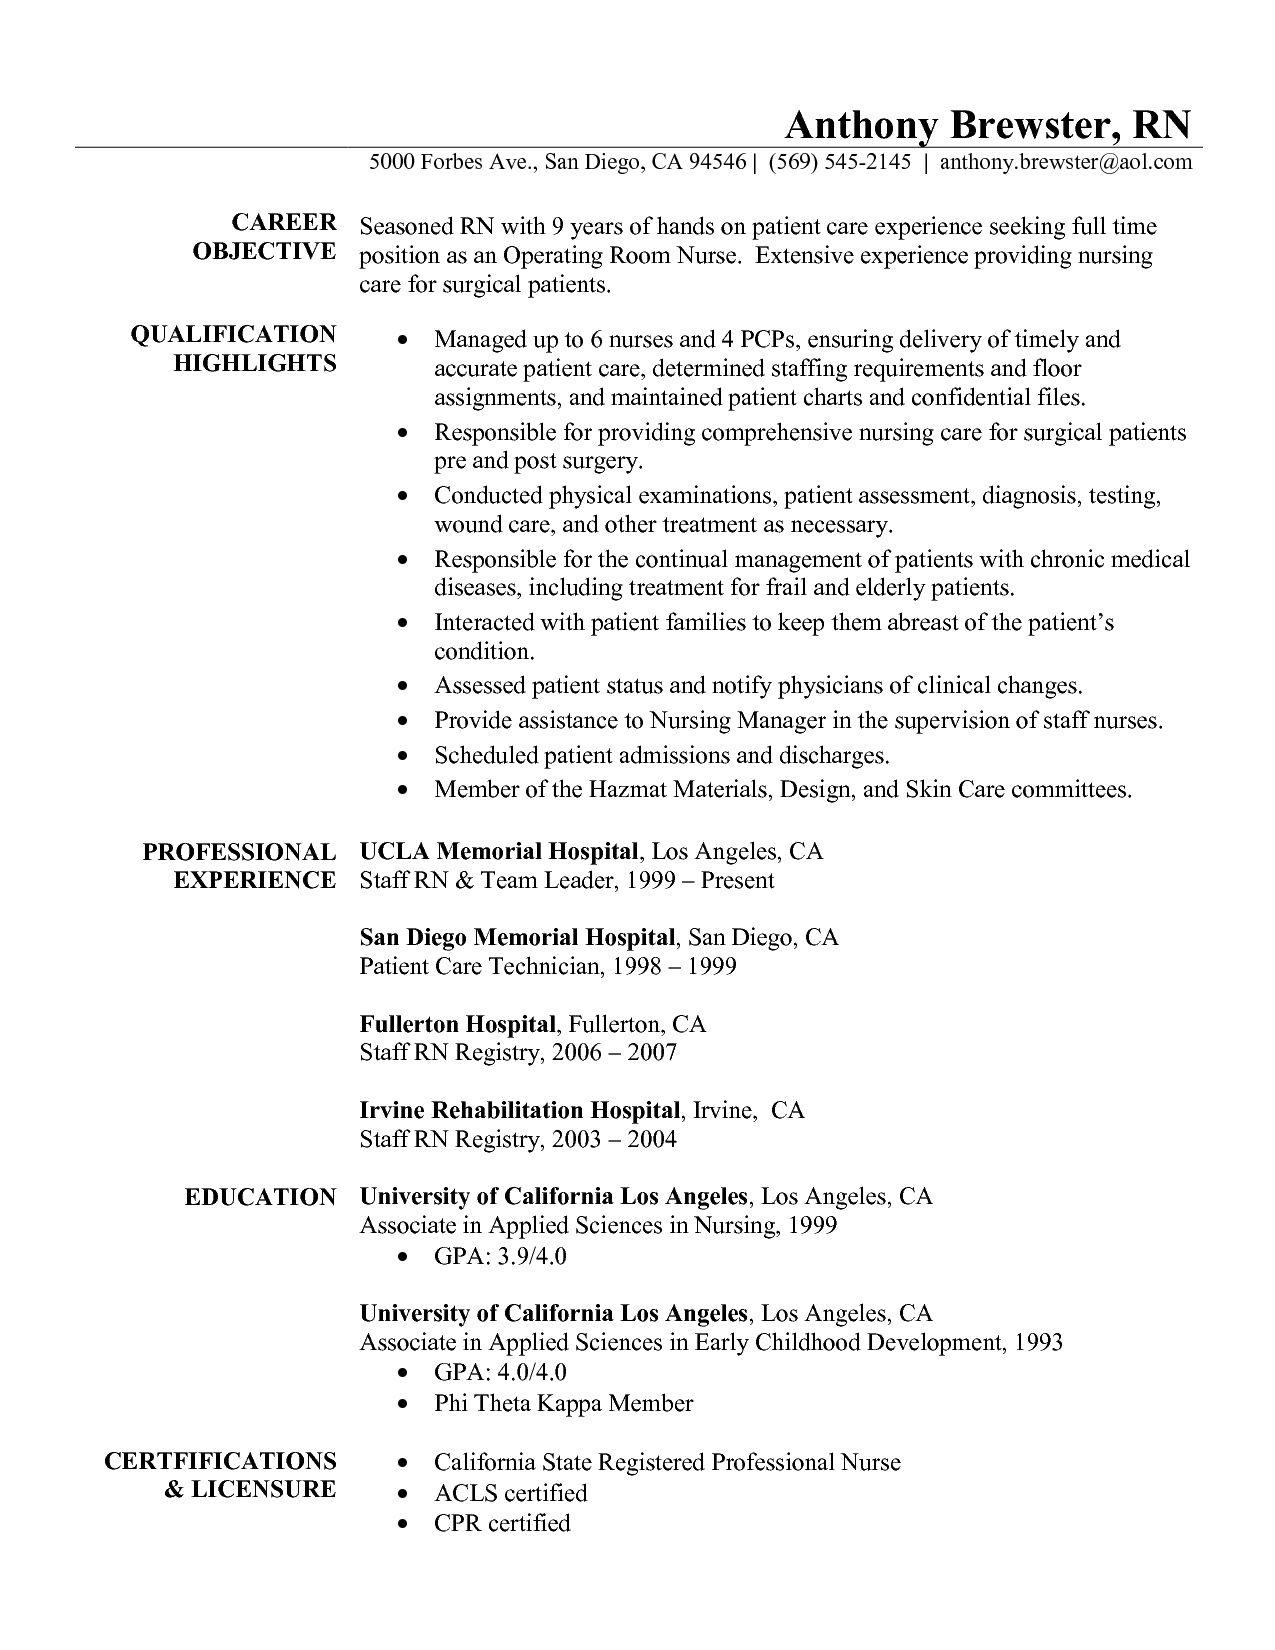 Nursing Resume Template 2017 Learnhowtoloseweight Net Nursing Resume Template Registered Nurse Resume Nursing Resume